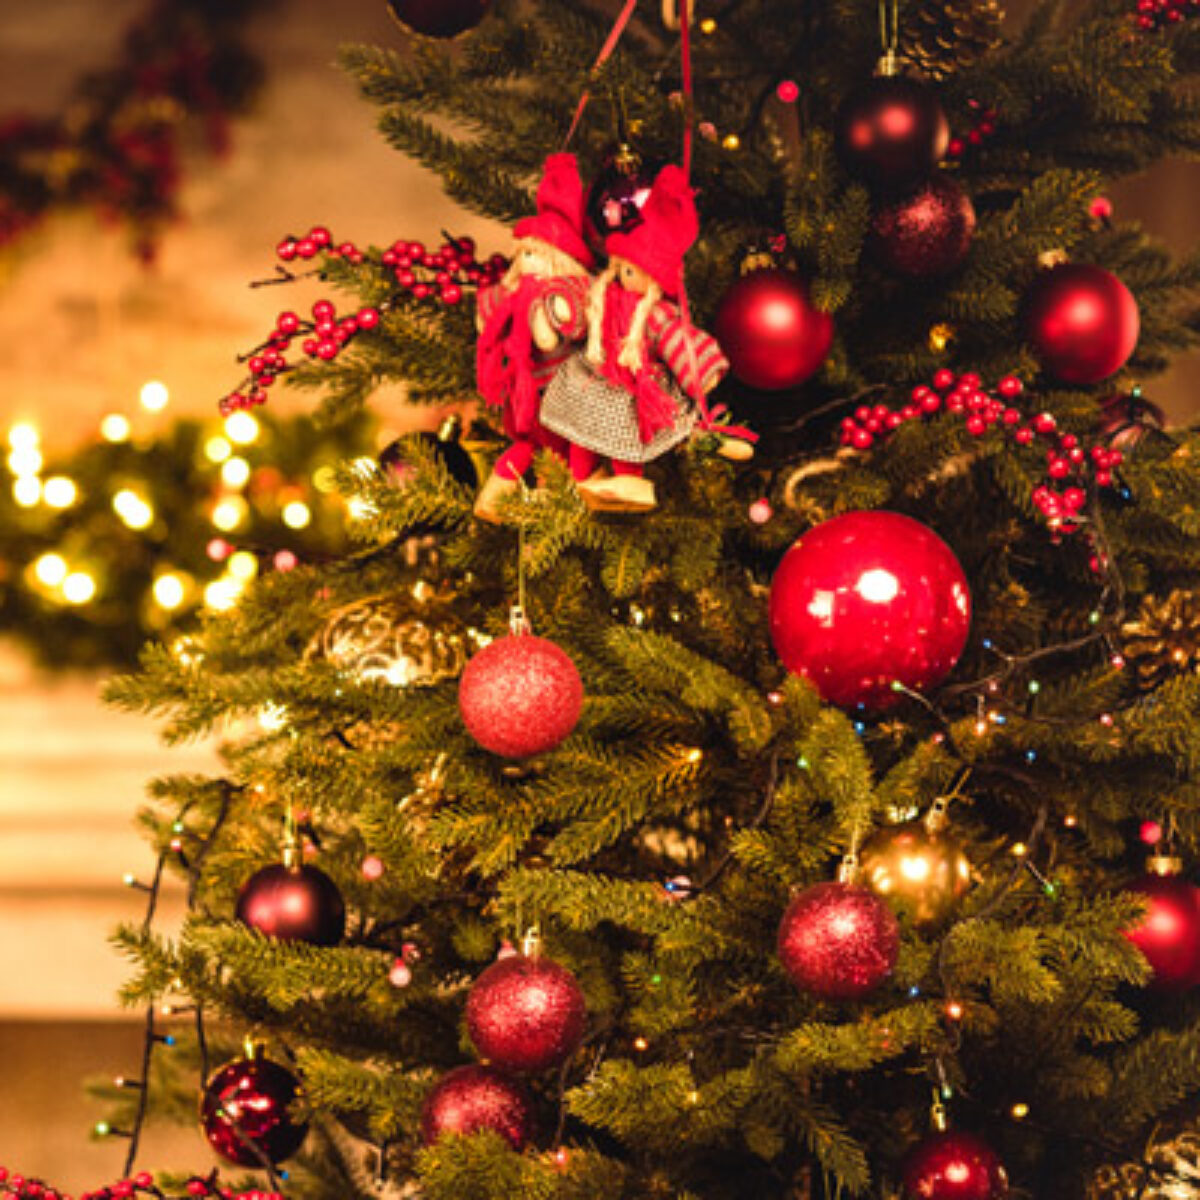 Christmas-holidays-safety-tips-2020